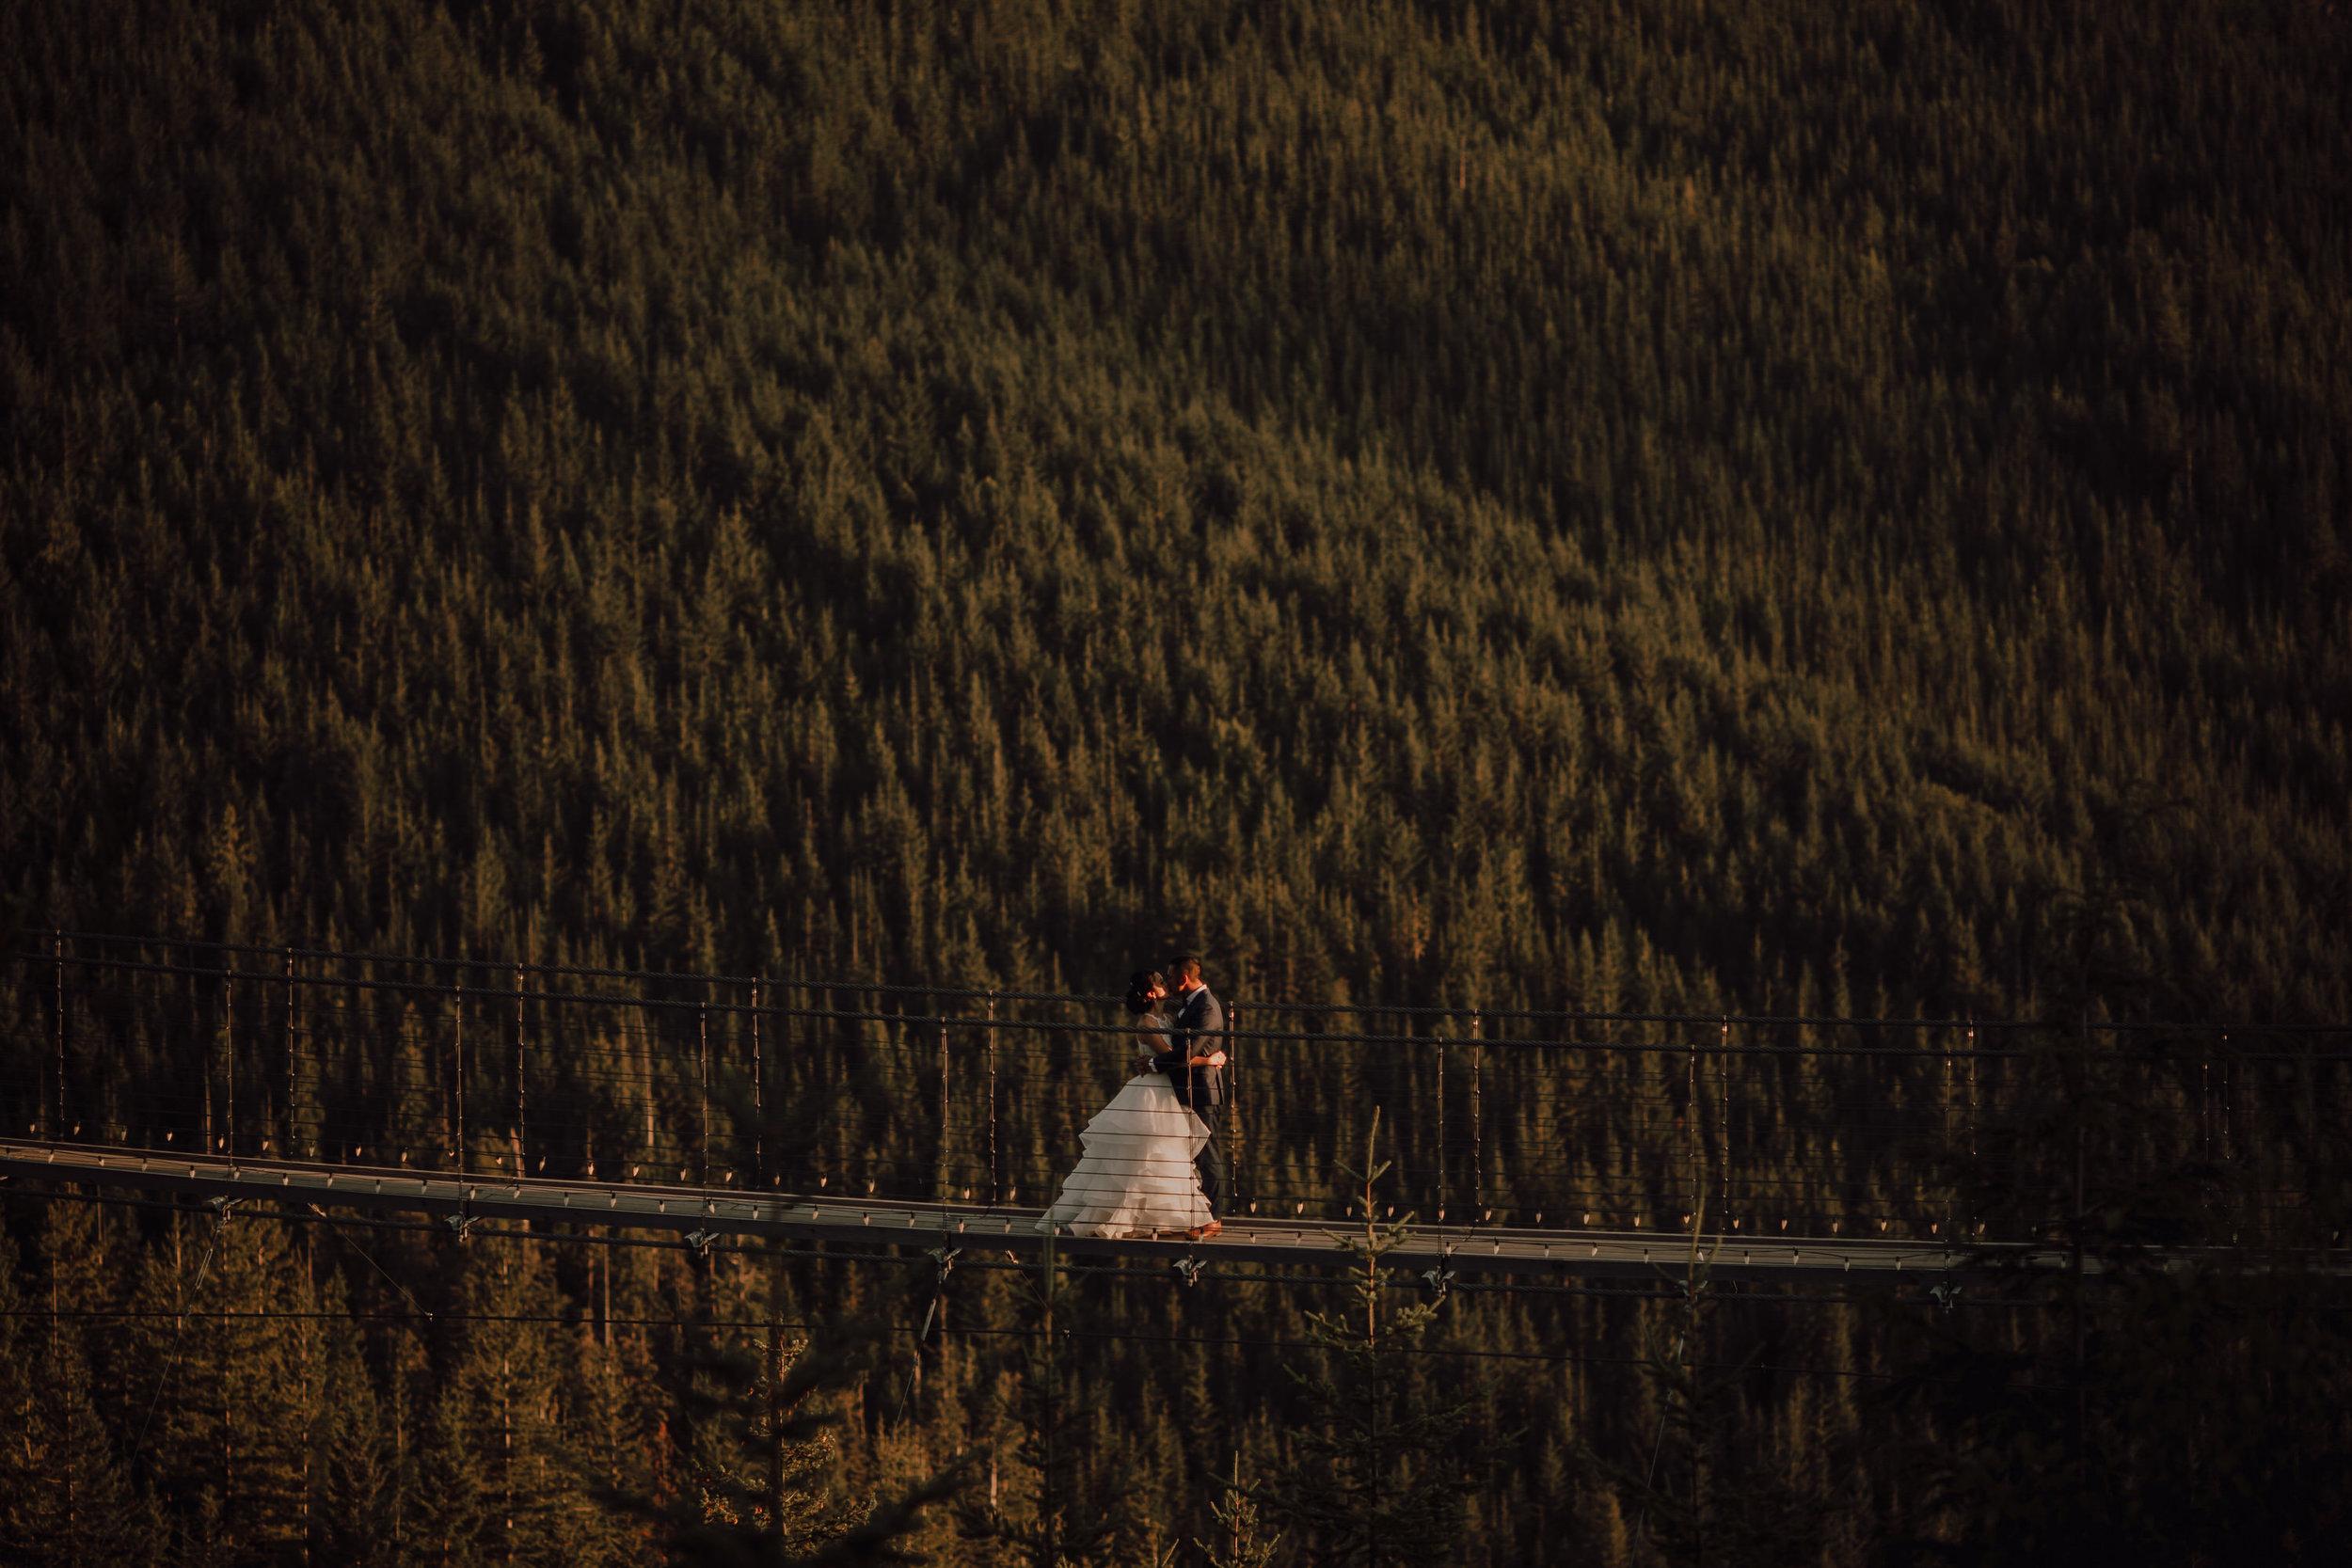 Squamish Wedding Photographer - Sea to Sky Gondola Wedding Photos -  Vancouver Wedding Photographer & Videographer - Sunshine Coast Wedding Photos - Sunshine Coast Wedding Photographer - Jennifer Picard Photography - IMG_0618.jpg